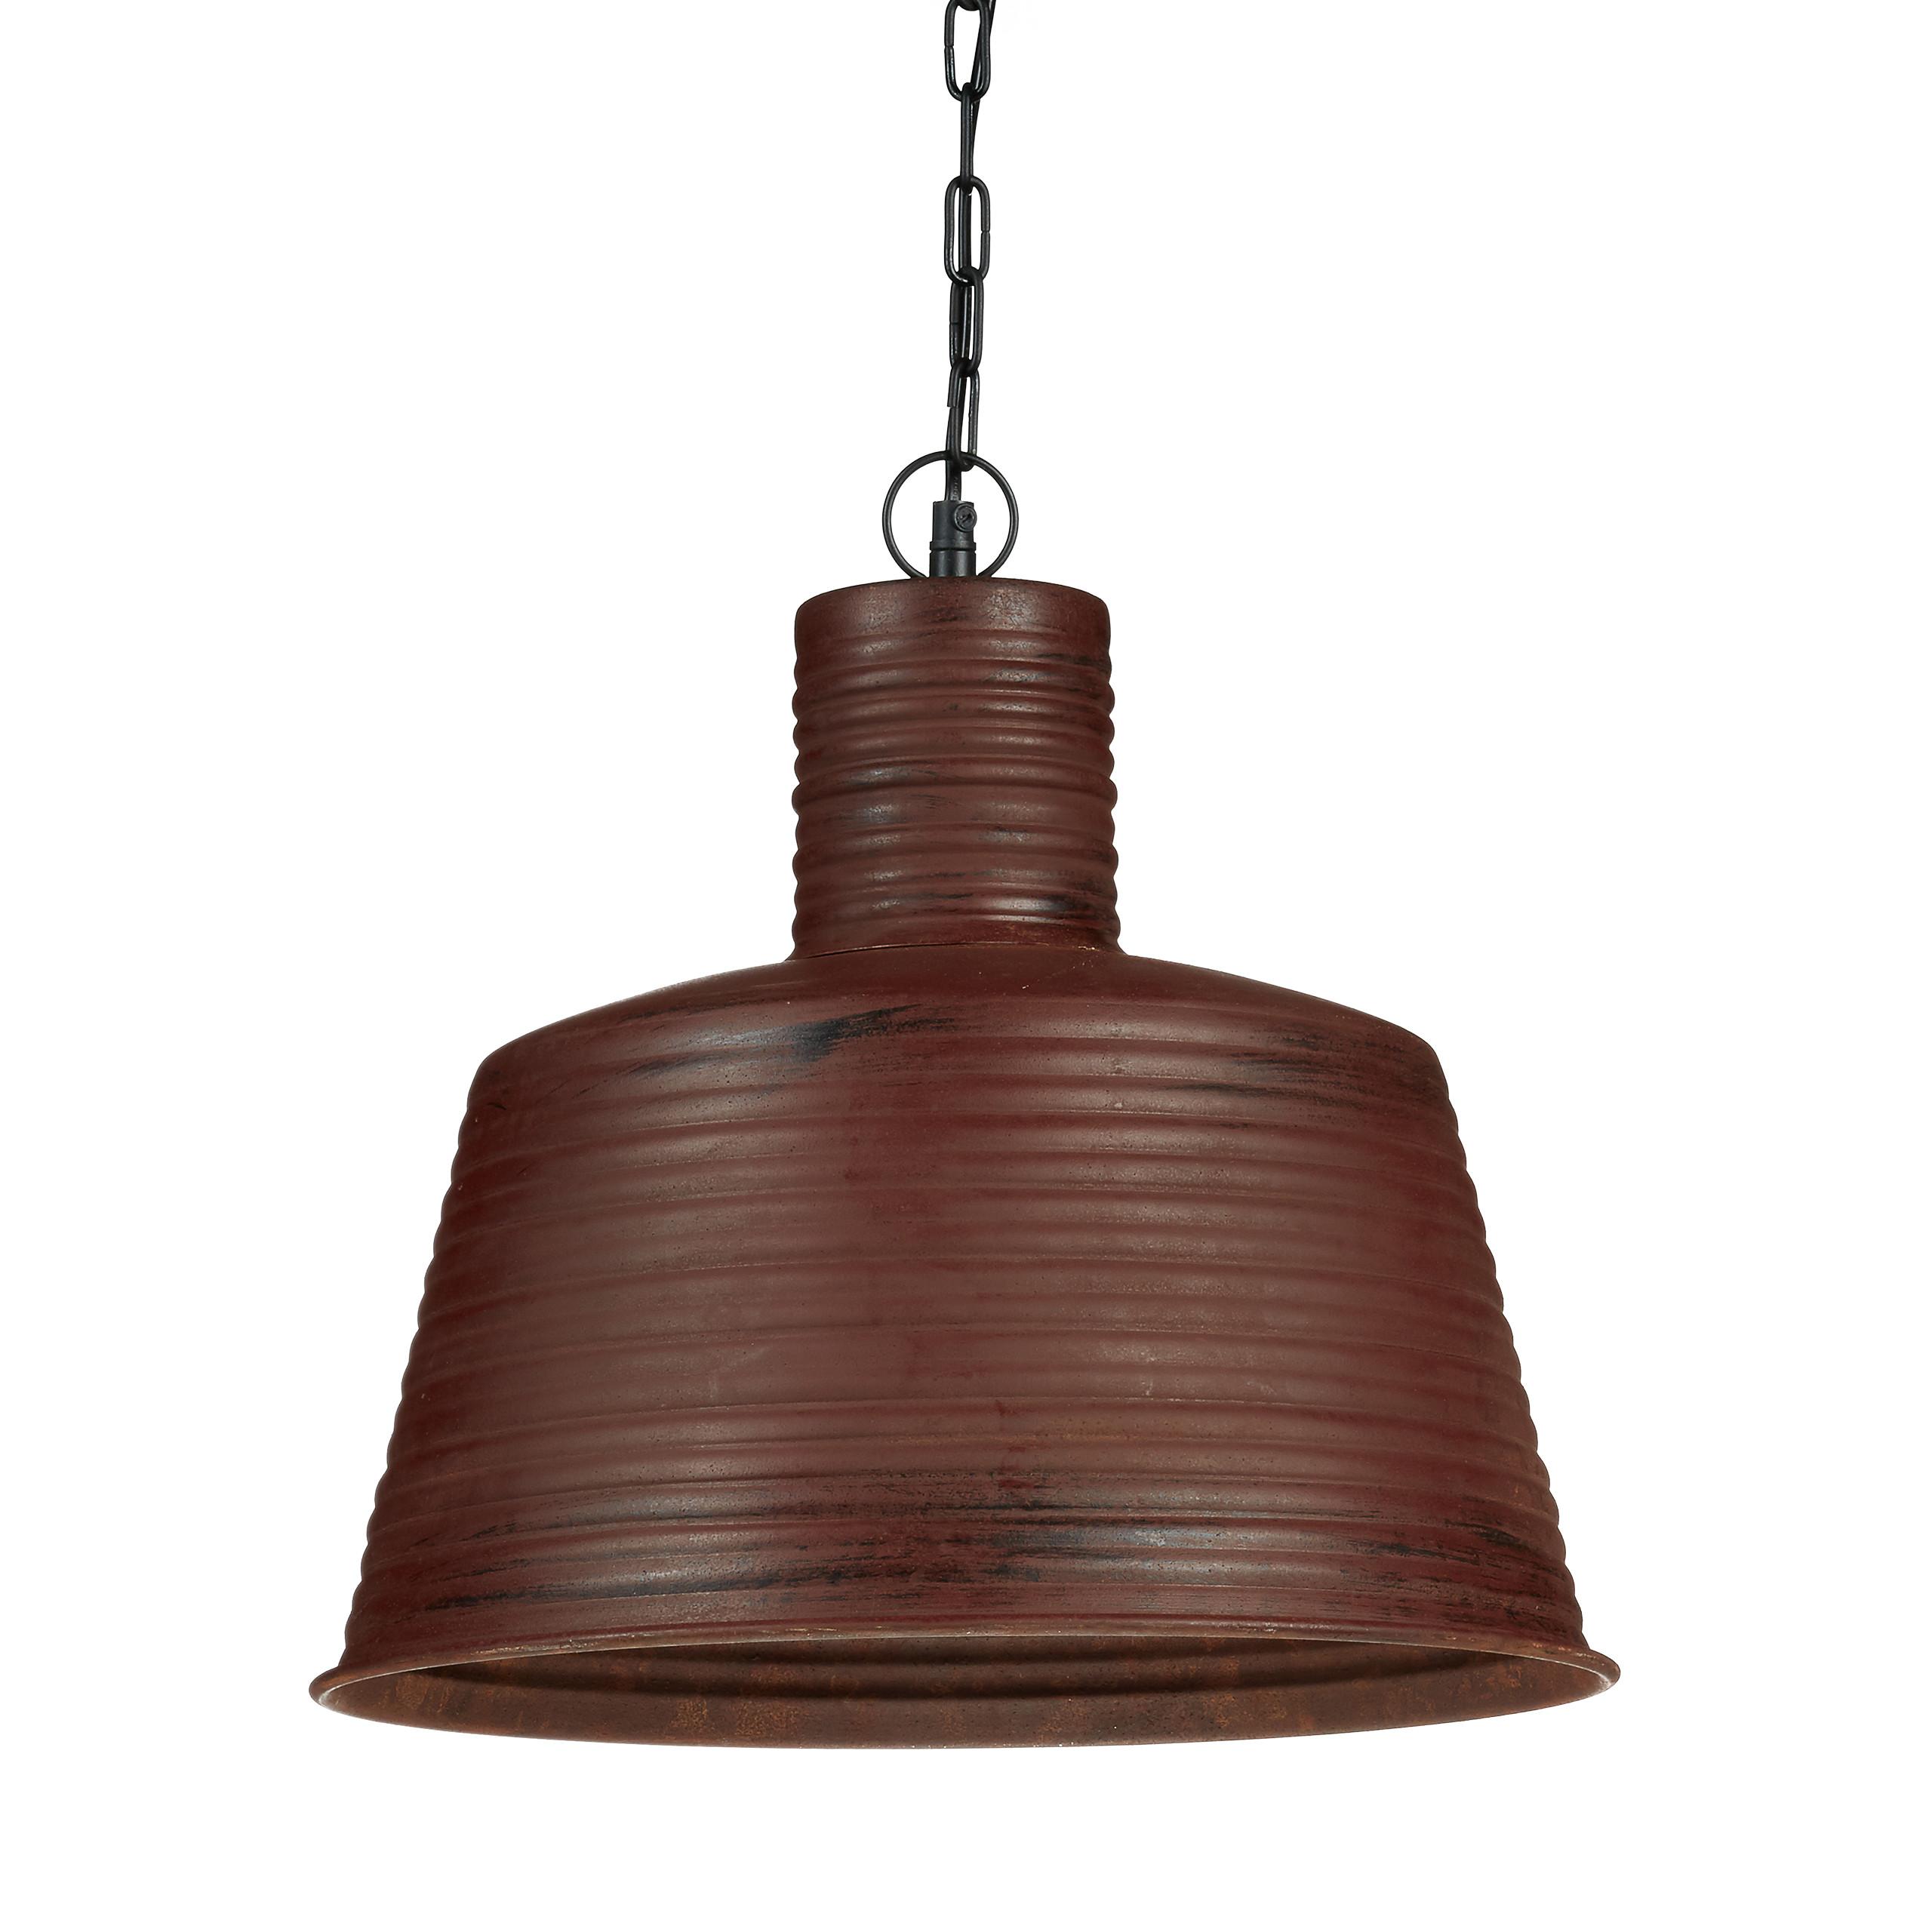 Pendelleuchte E27 Industriell Metall rostfarbig Vintage